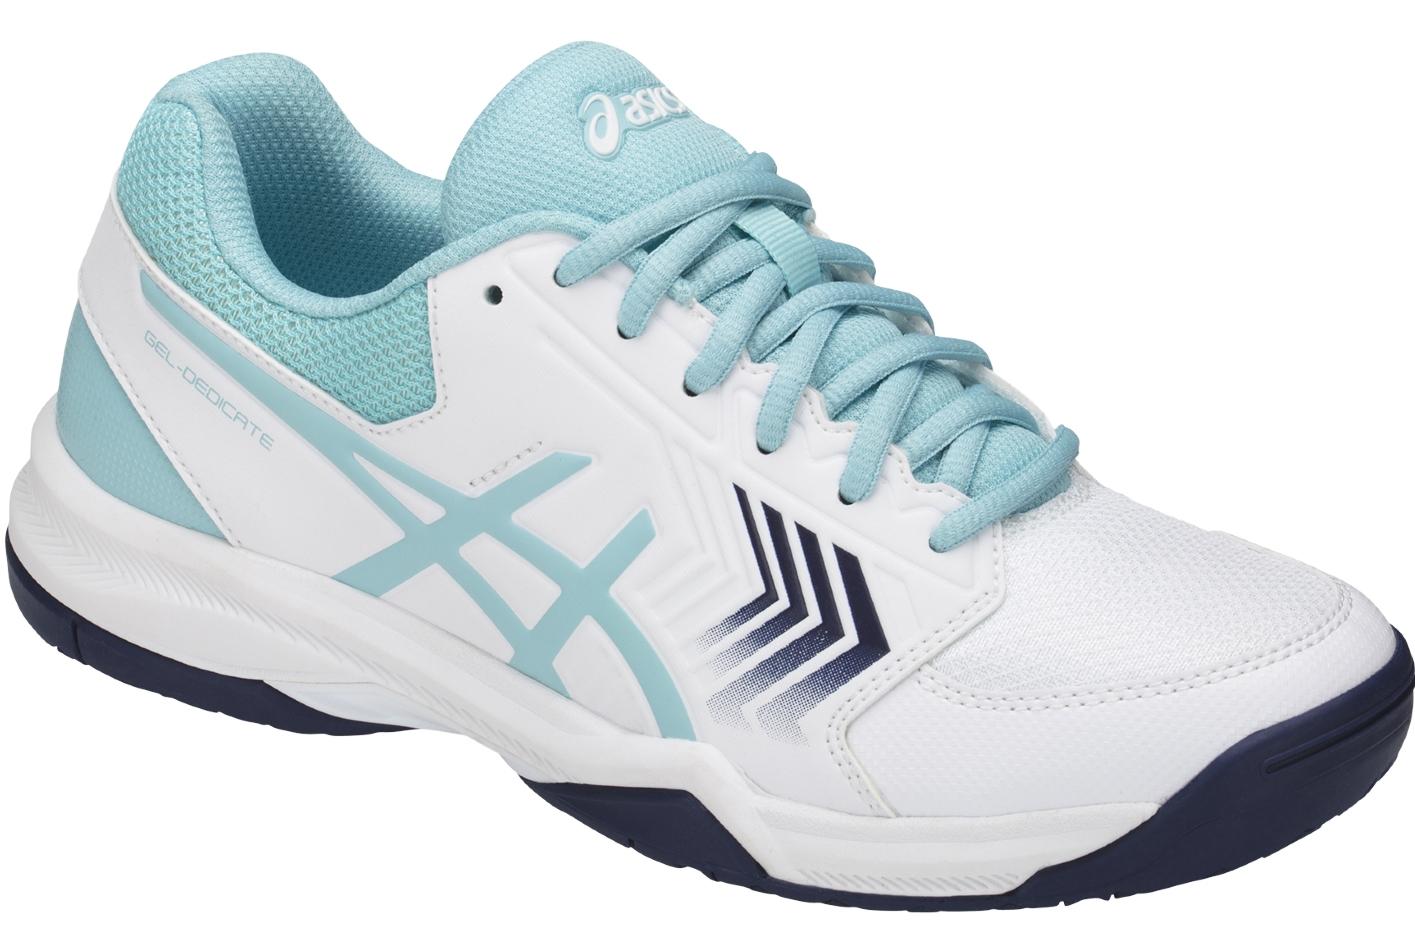 E757y 0114 Gel Chaussures Femme De Asics Rose Tennis Dedicate 5 UMSqzVp